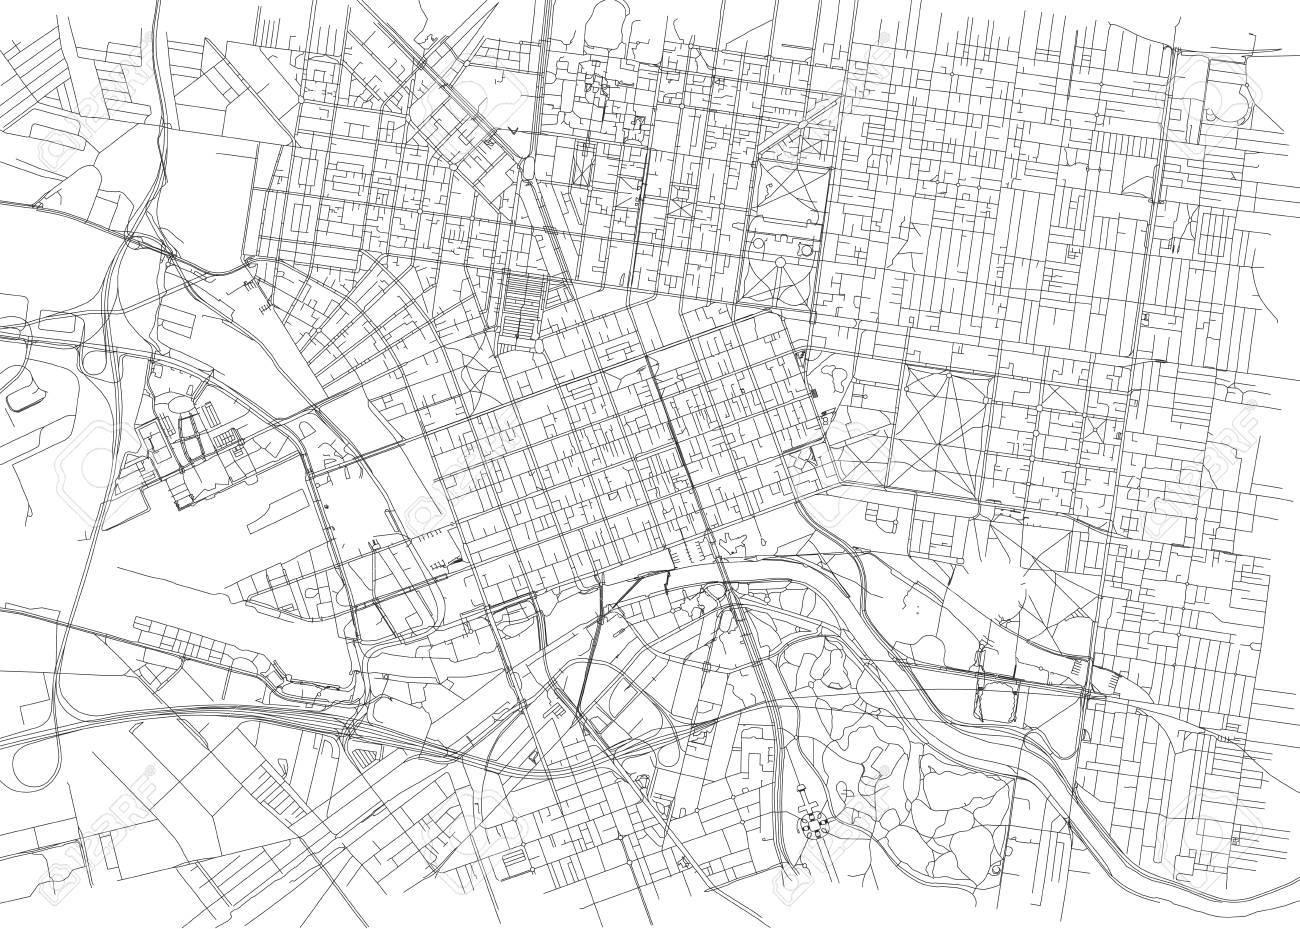 Melbourne Australia City Map.Streets Of Melbourne City Map Australia Street Map Royalty Free